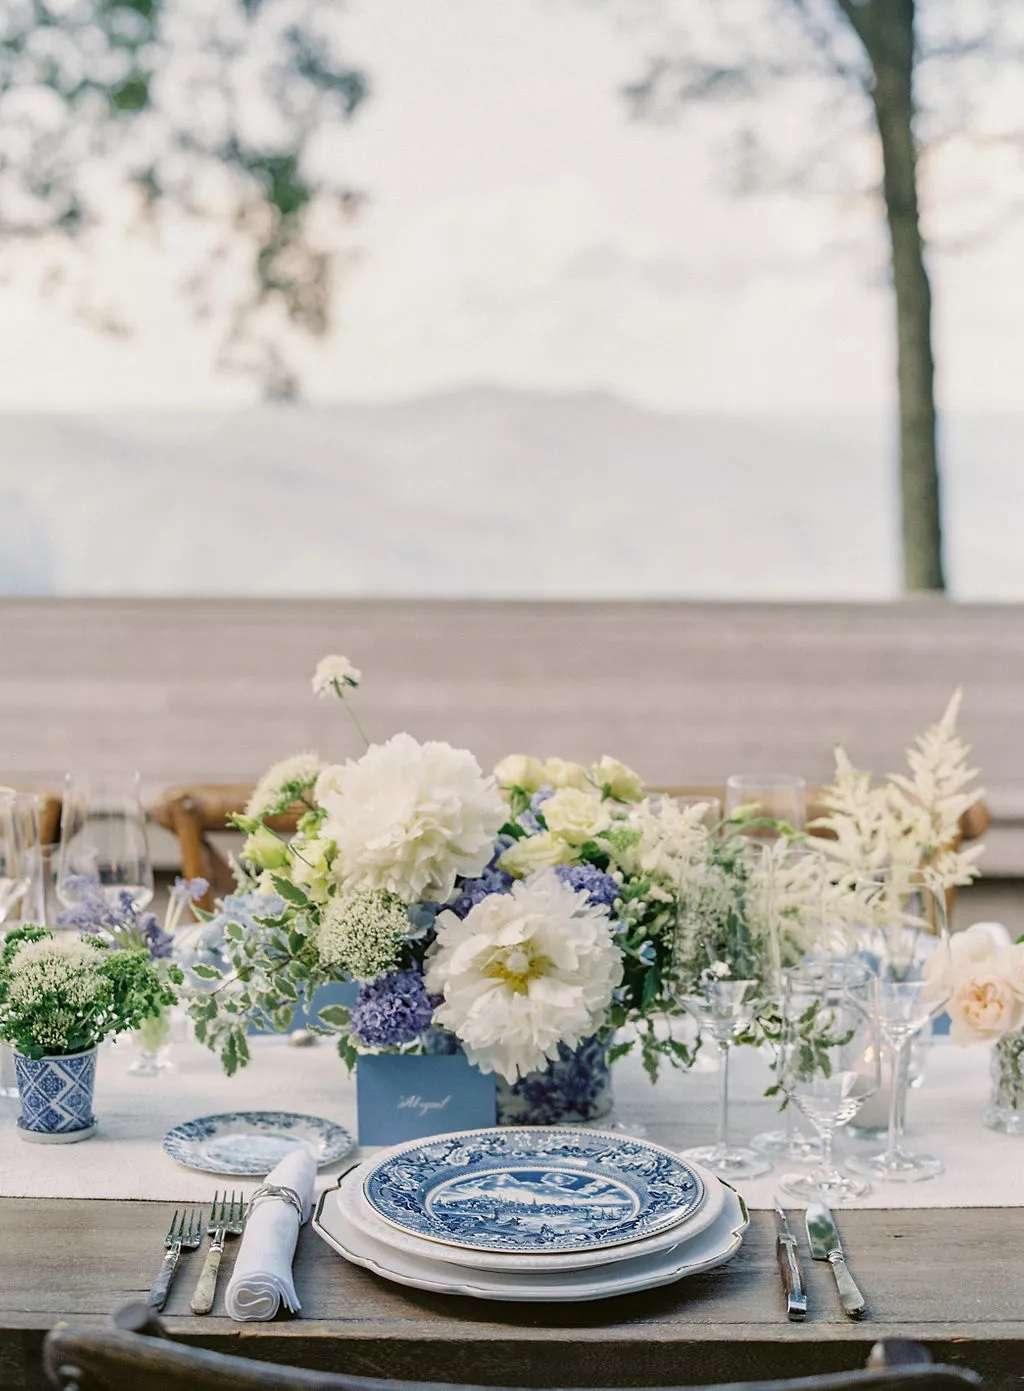 blue and white flower centerpiece